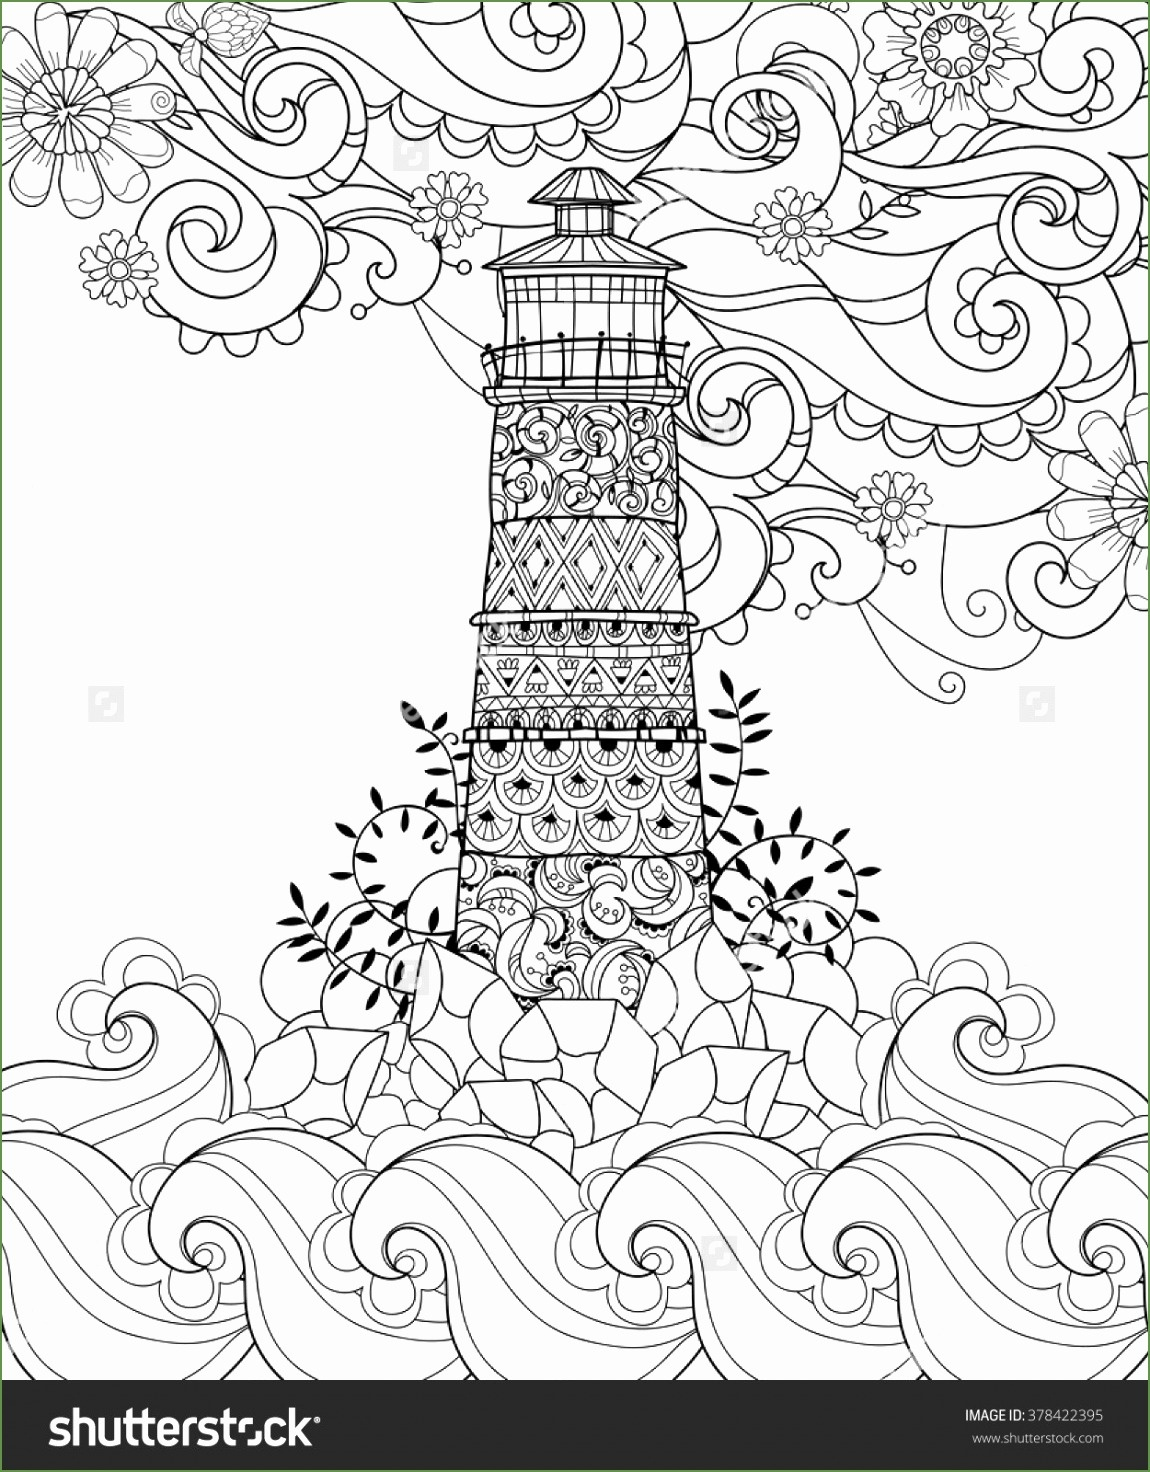 5 Zentangle Printables 51104 | Kayra Examples - Free Printable Zentangle Templates